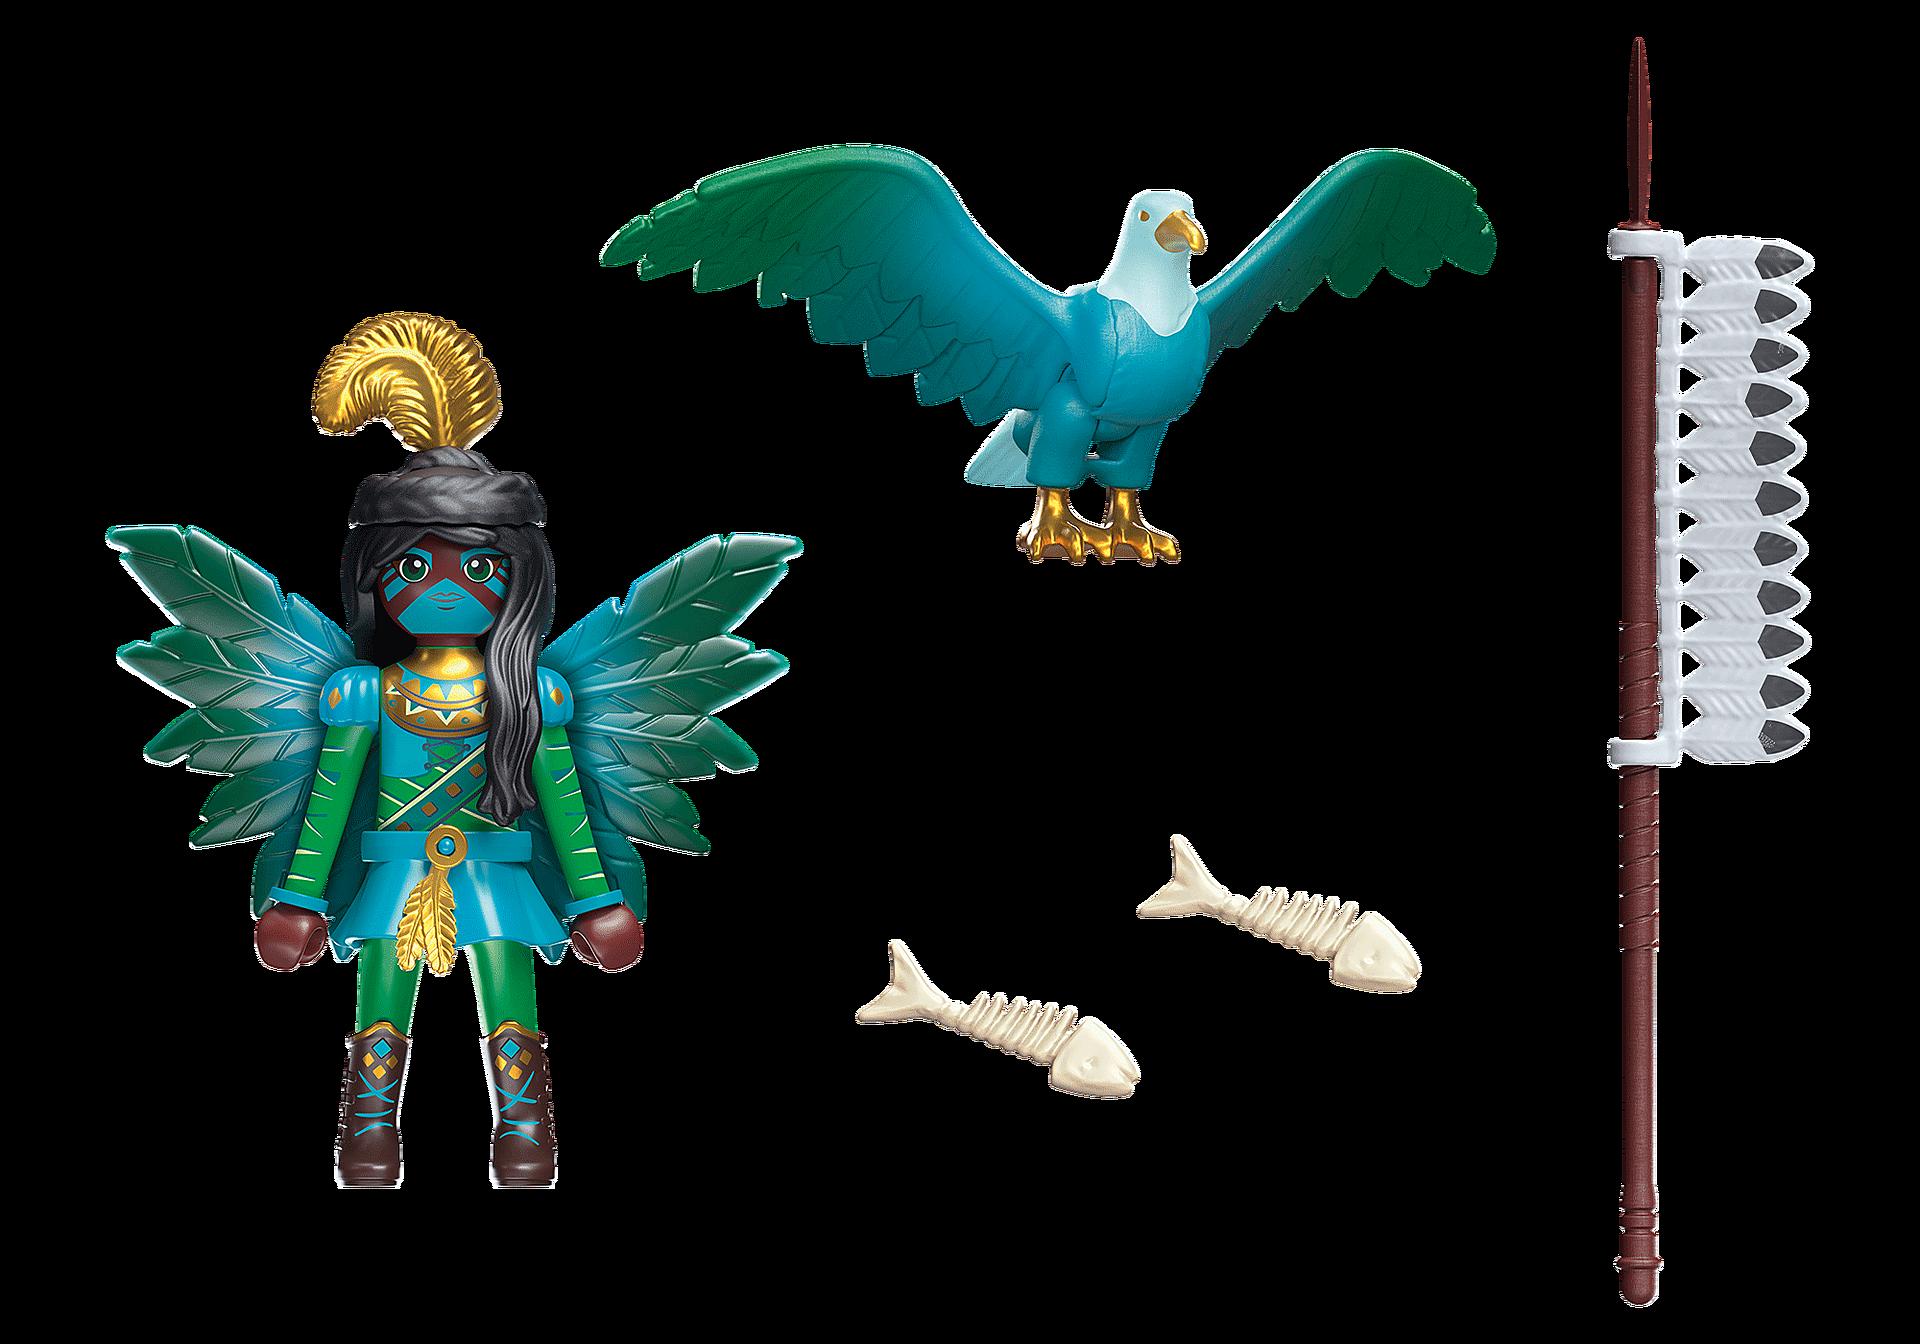 70802 Knight Fairy mit Seelentier zoom image4